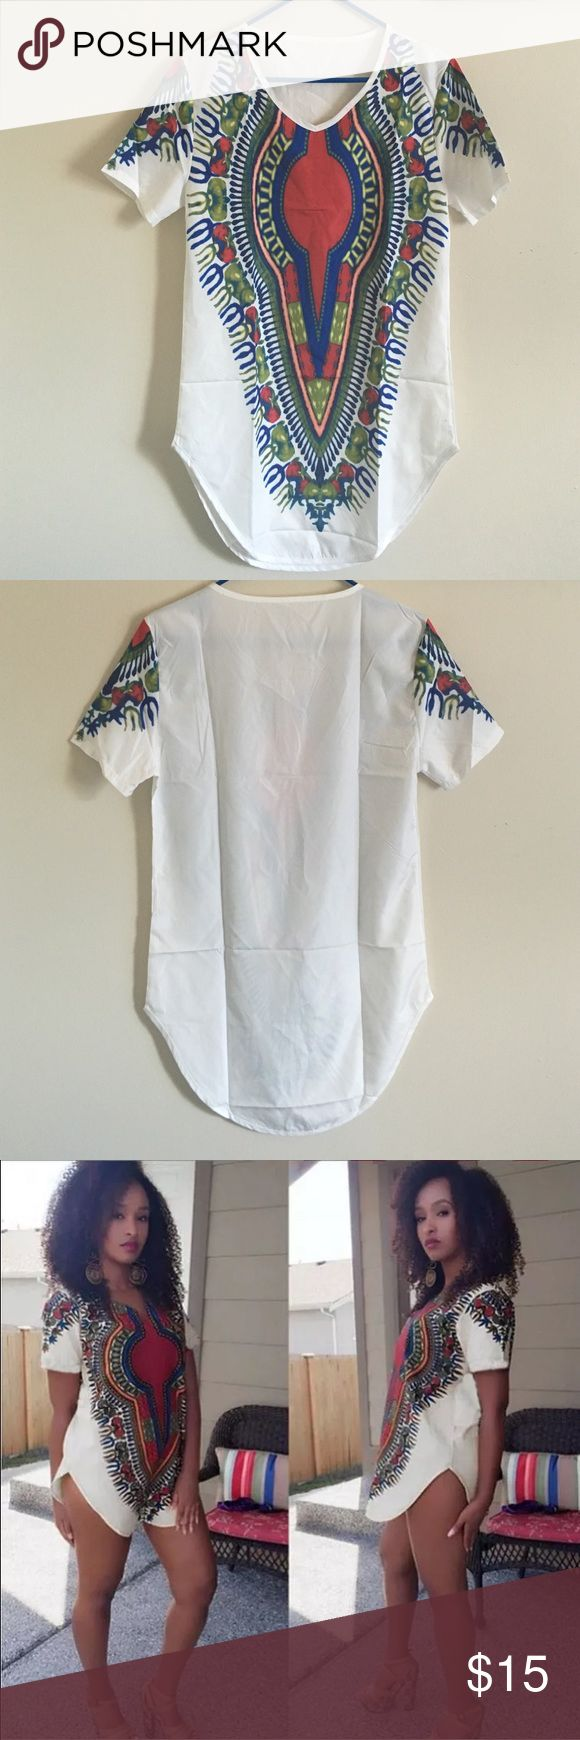 Dashiki shirt dress It's a size medium but fits like a xsmall or small. Brand new, never worn Tops Tunics